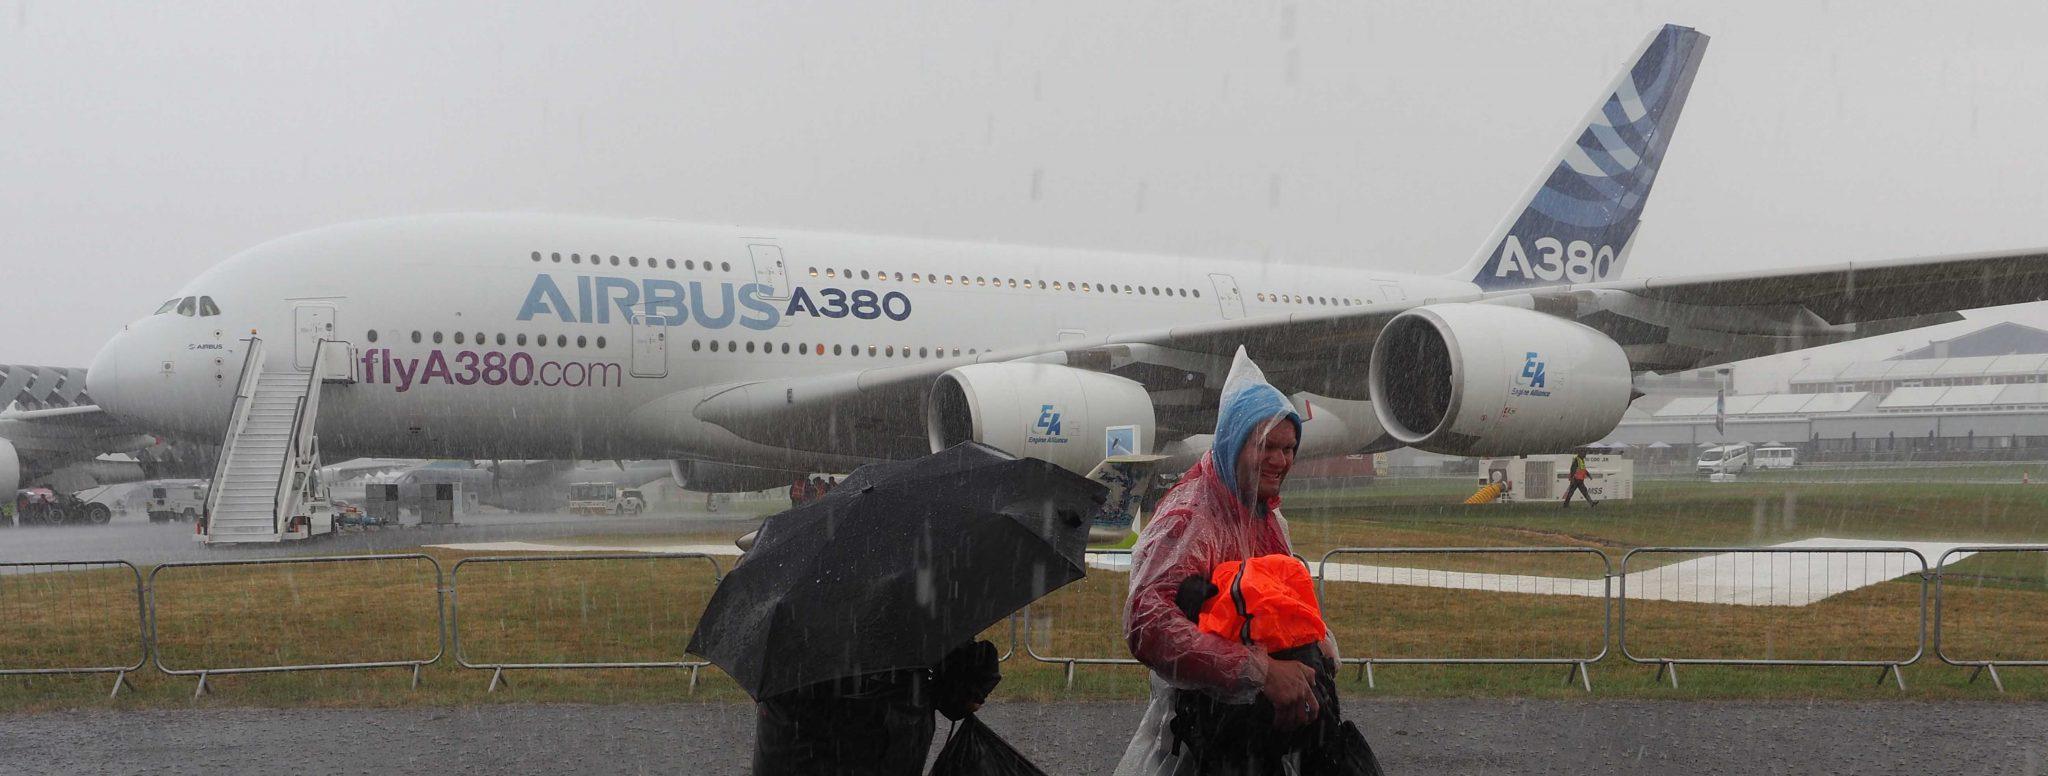 RAIN STORM CLOSES FARNBOROUGH AIRSHOW !